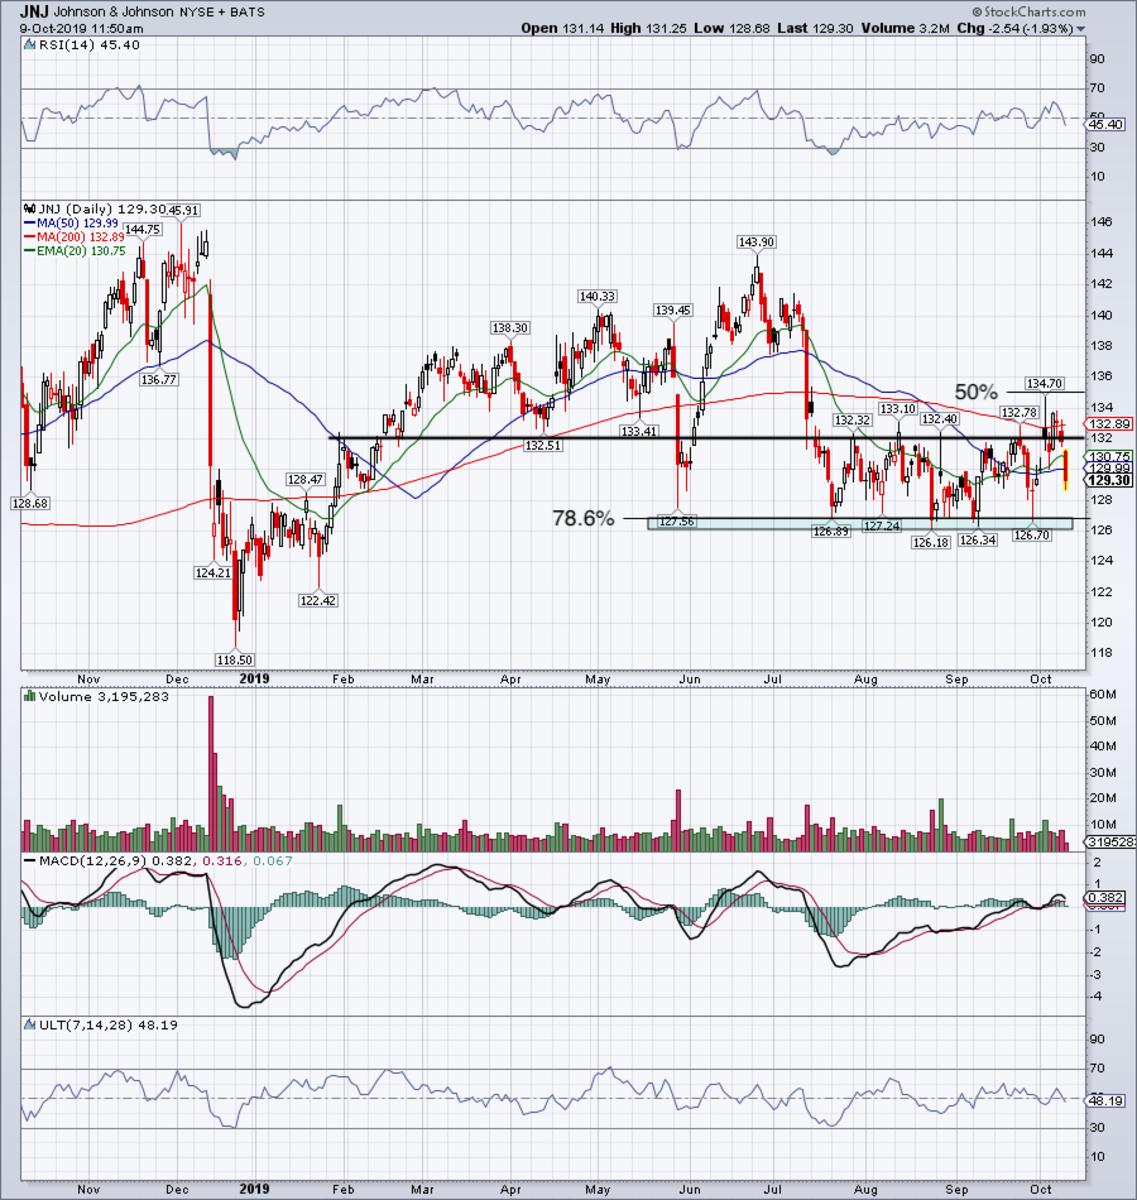 Daily chart of Johnson & Johnson stock.